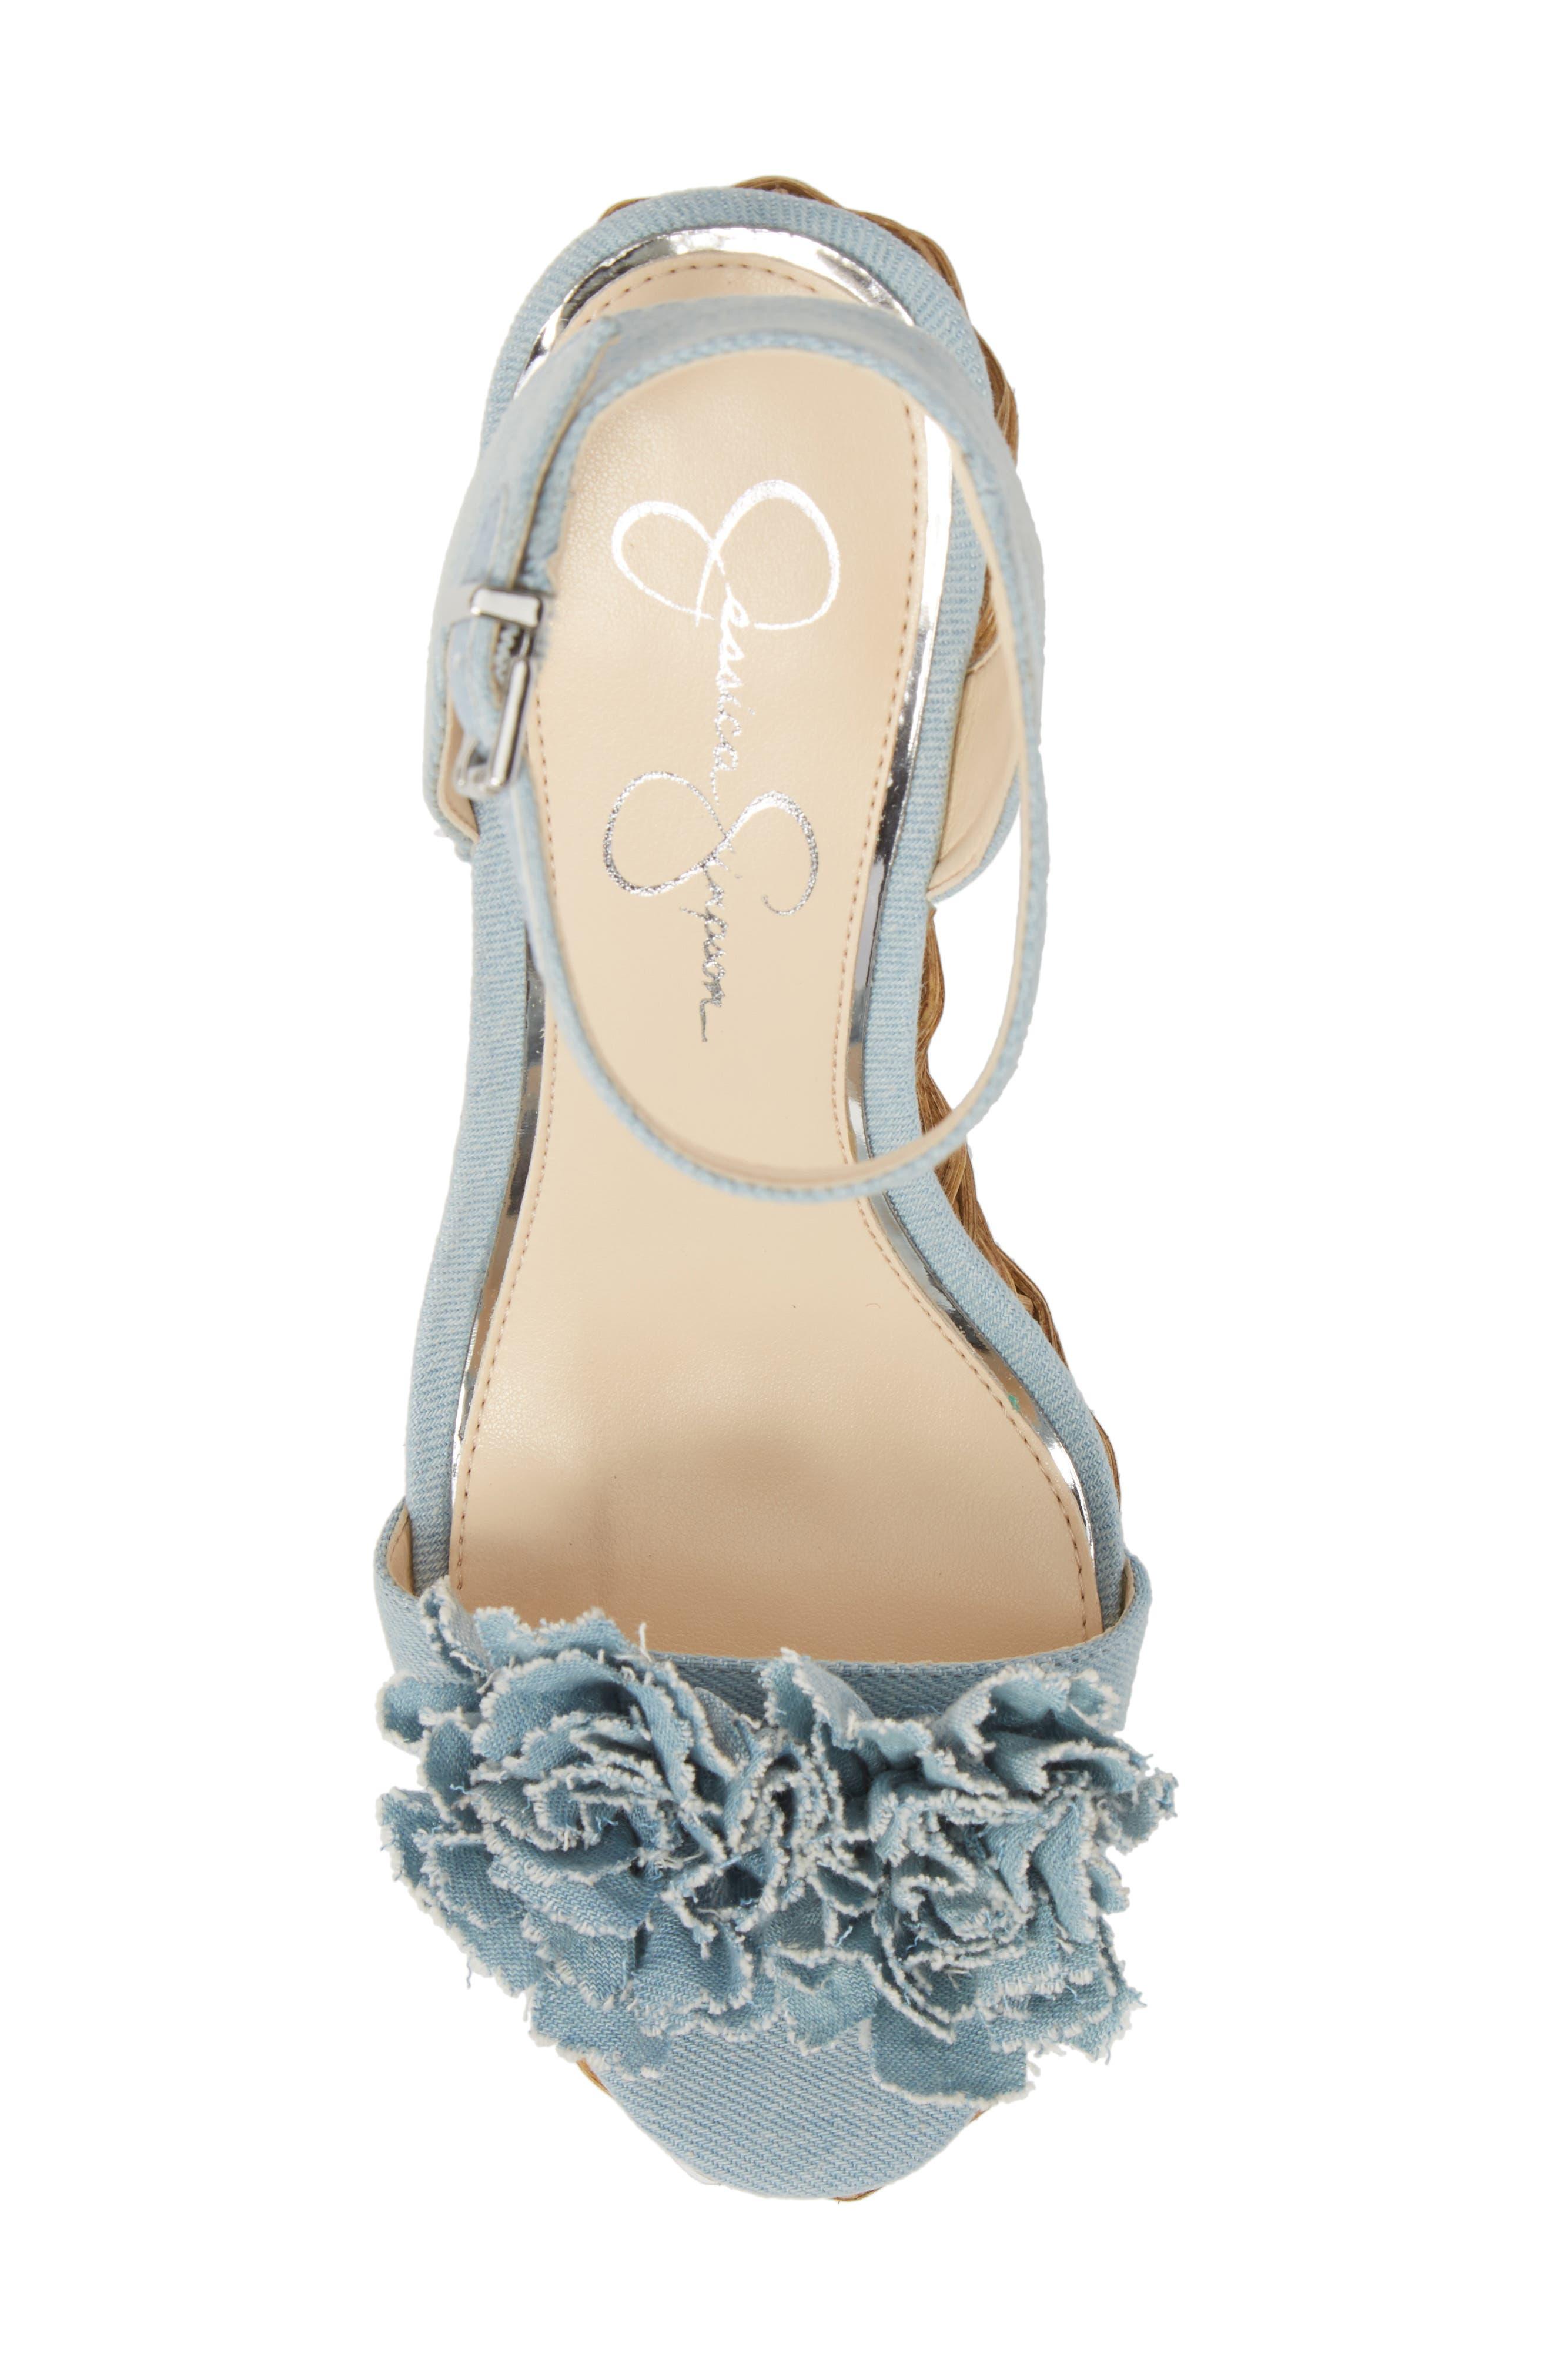 Pressa Platform Wedge Sandal,                             Alternate thumbnail 5, color,                             VINTAGE BLUE